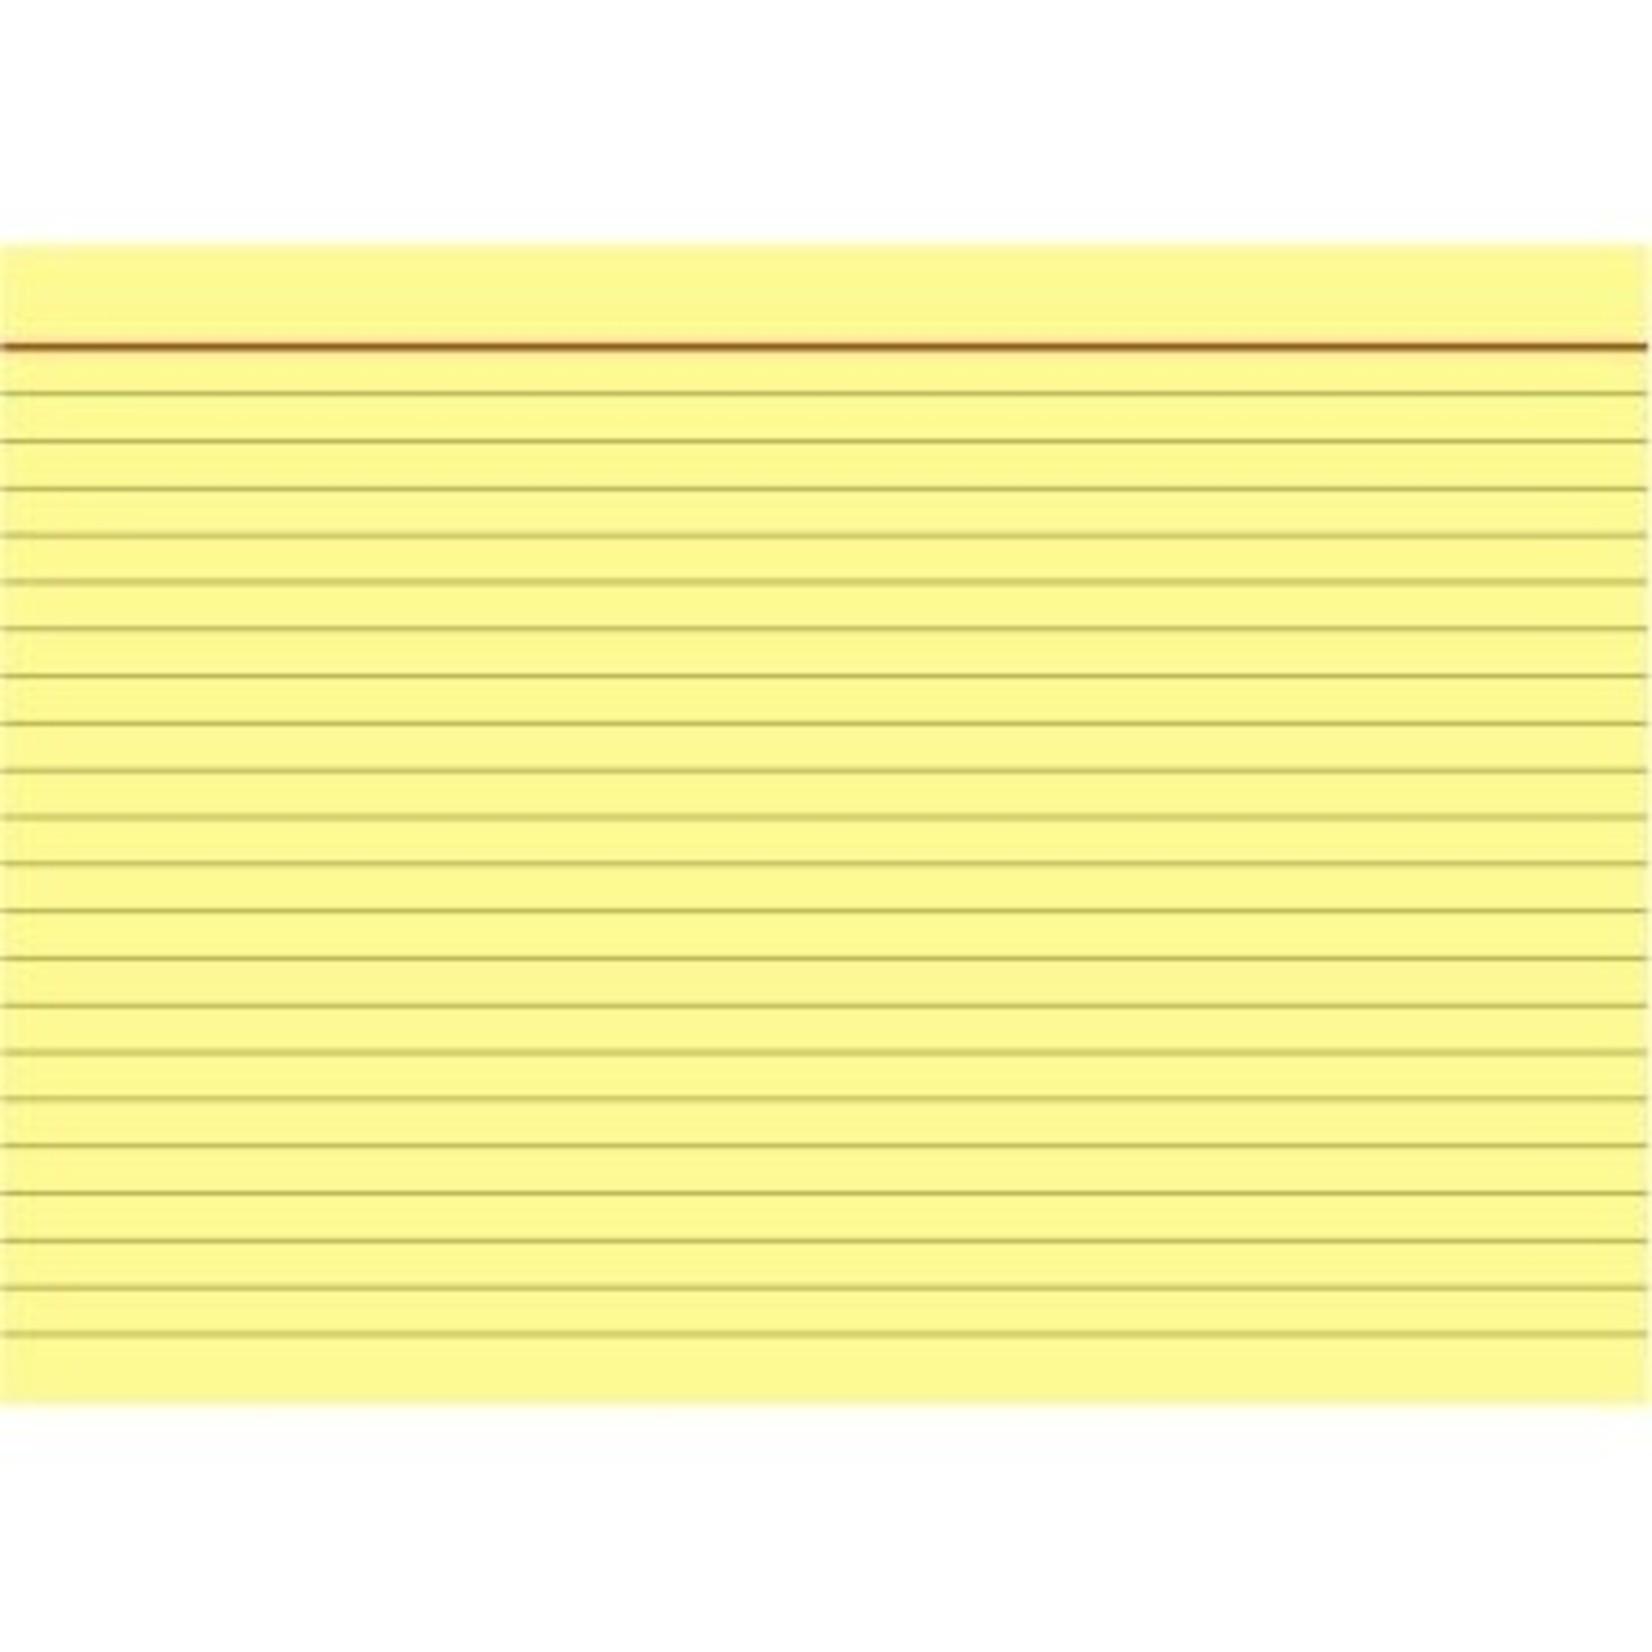 BRUNNEN Karteikarte DIN A5 quer liniert gelb 100 St./Pack.